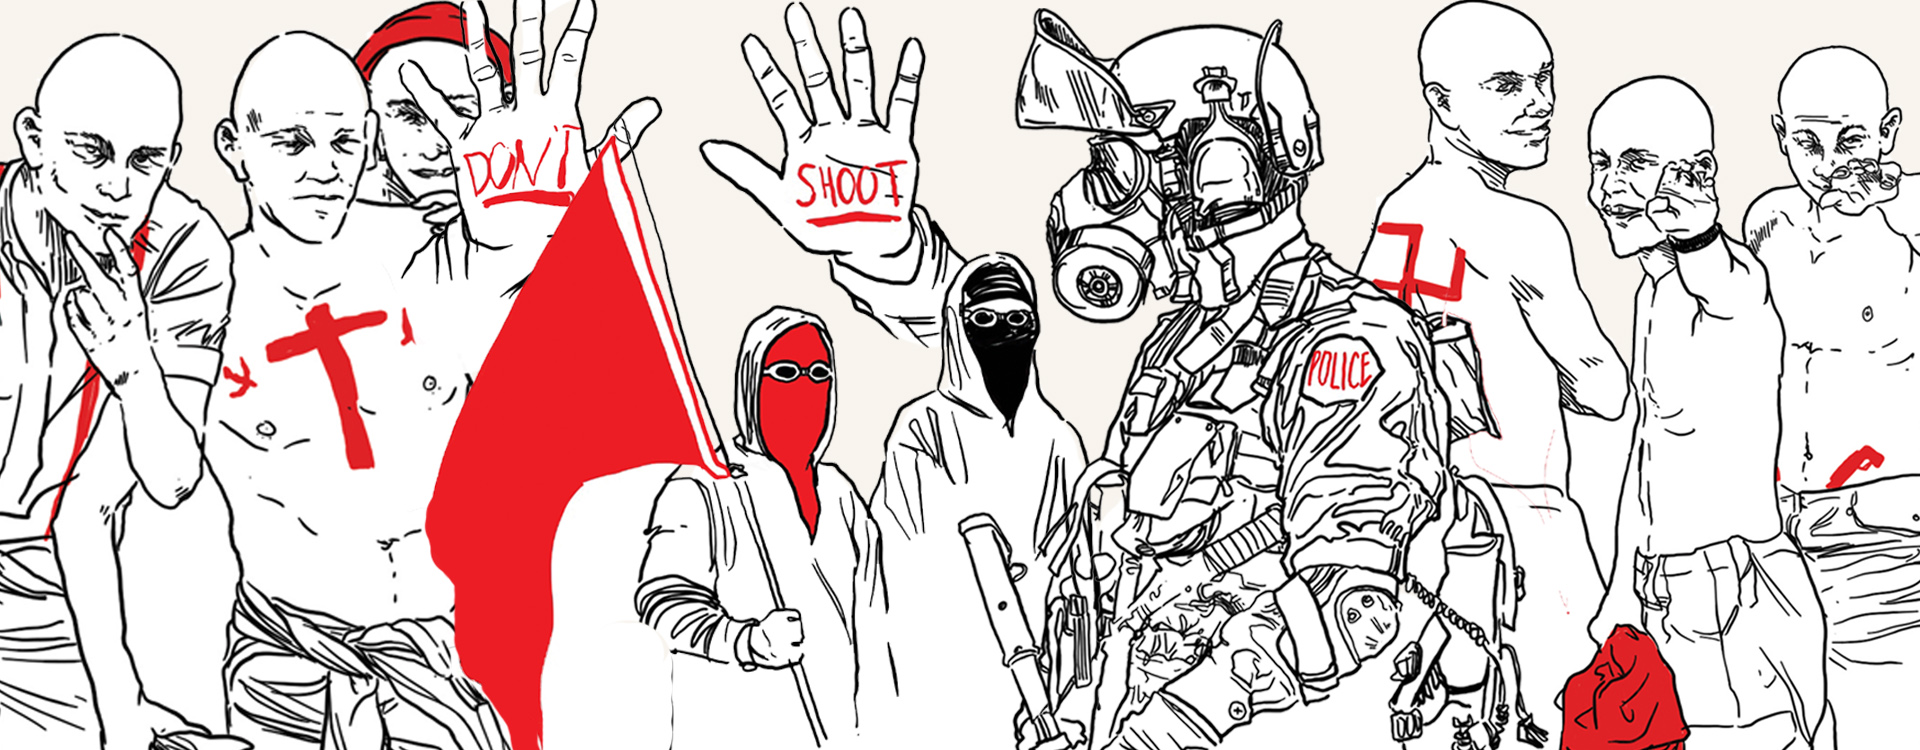 Anti-Anti-Antifa | A M  Gittlitz